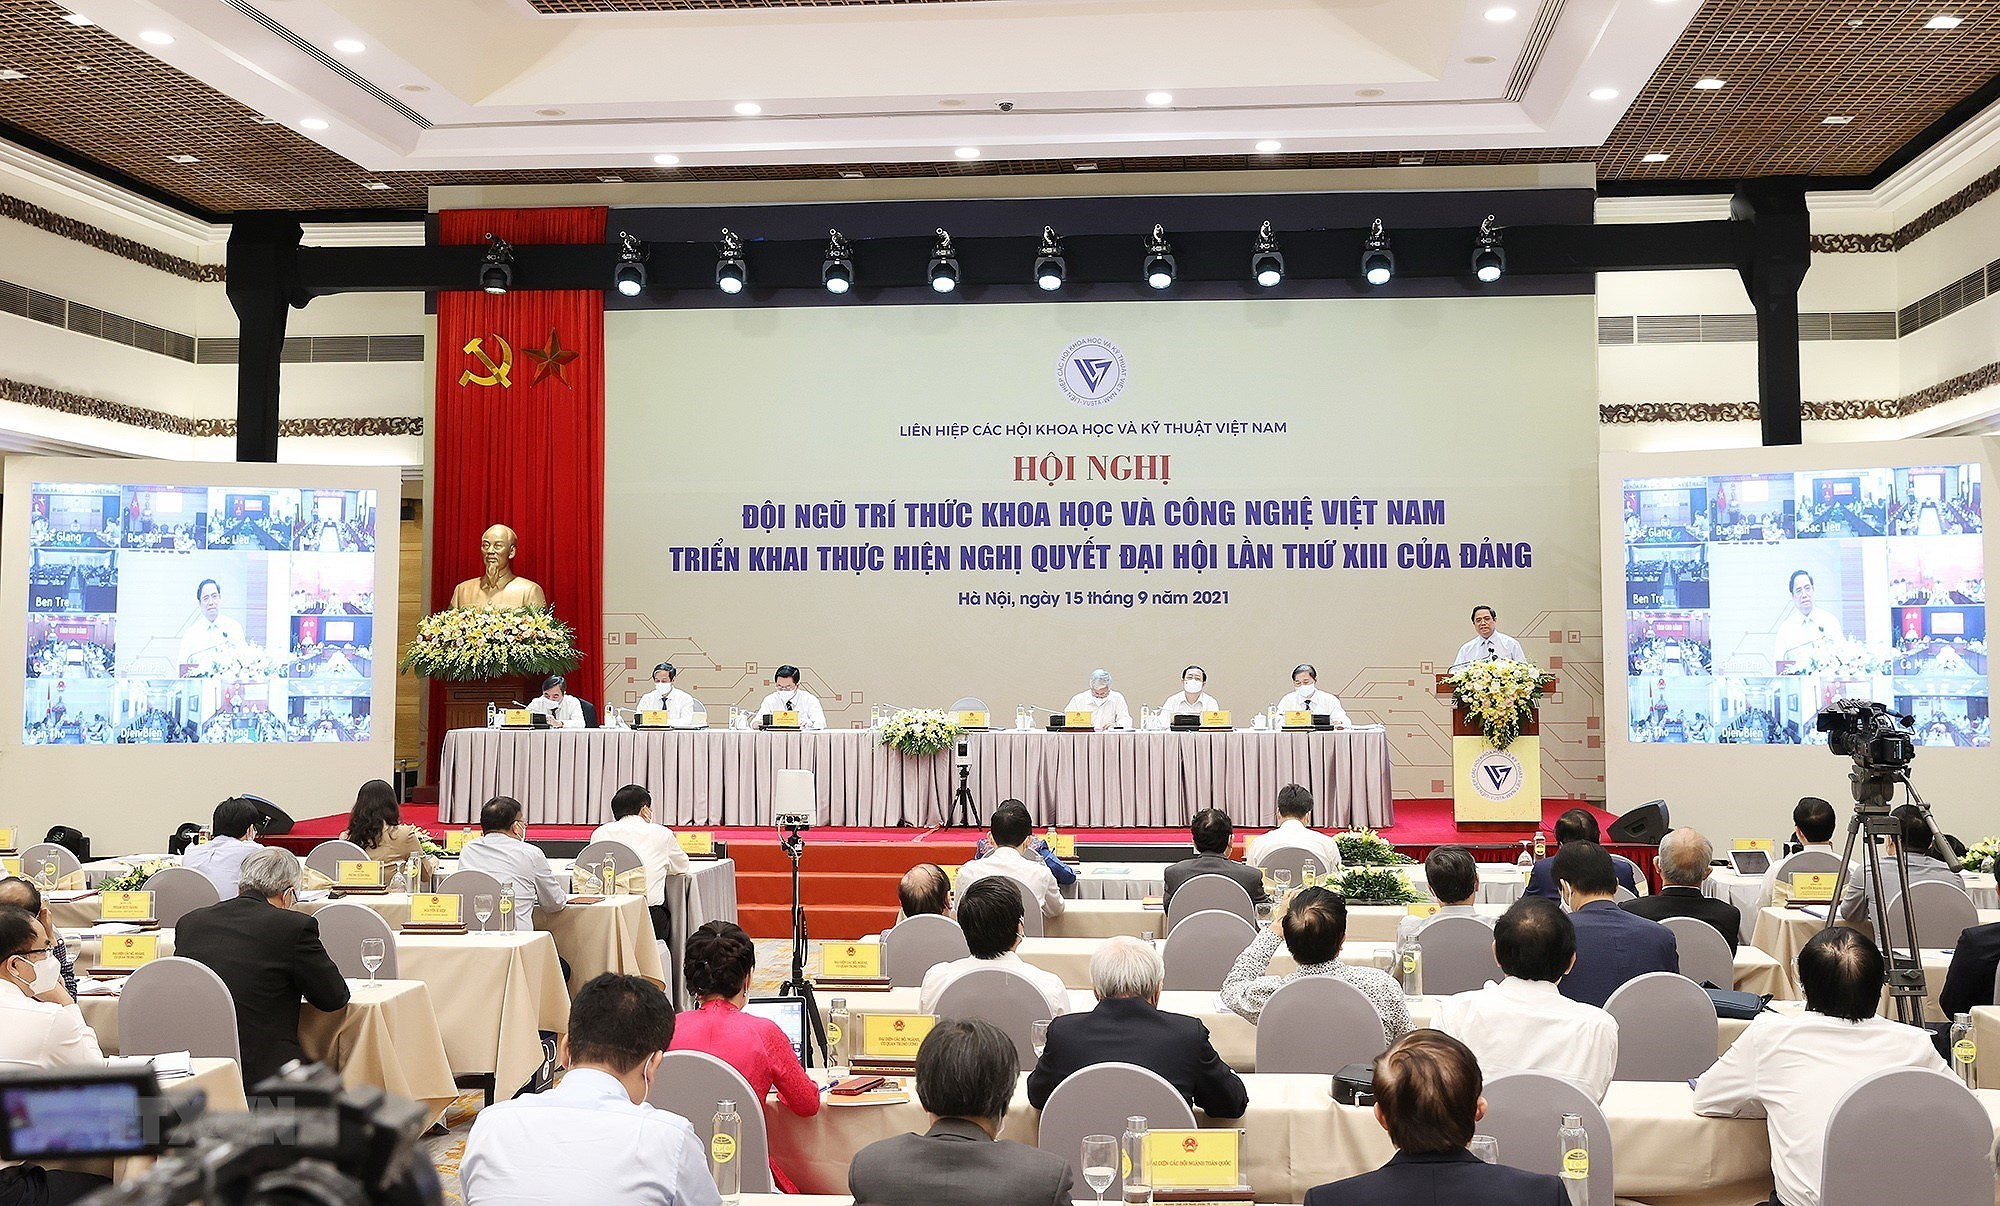 Thu tuong du Hoi nghi doi ngu tri thuc khoa hoc va cong nghe Viet Nam hinh anh 6